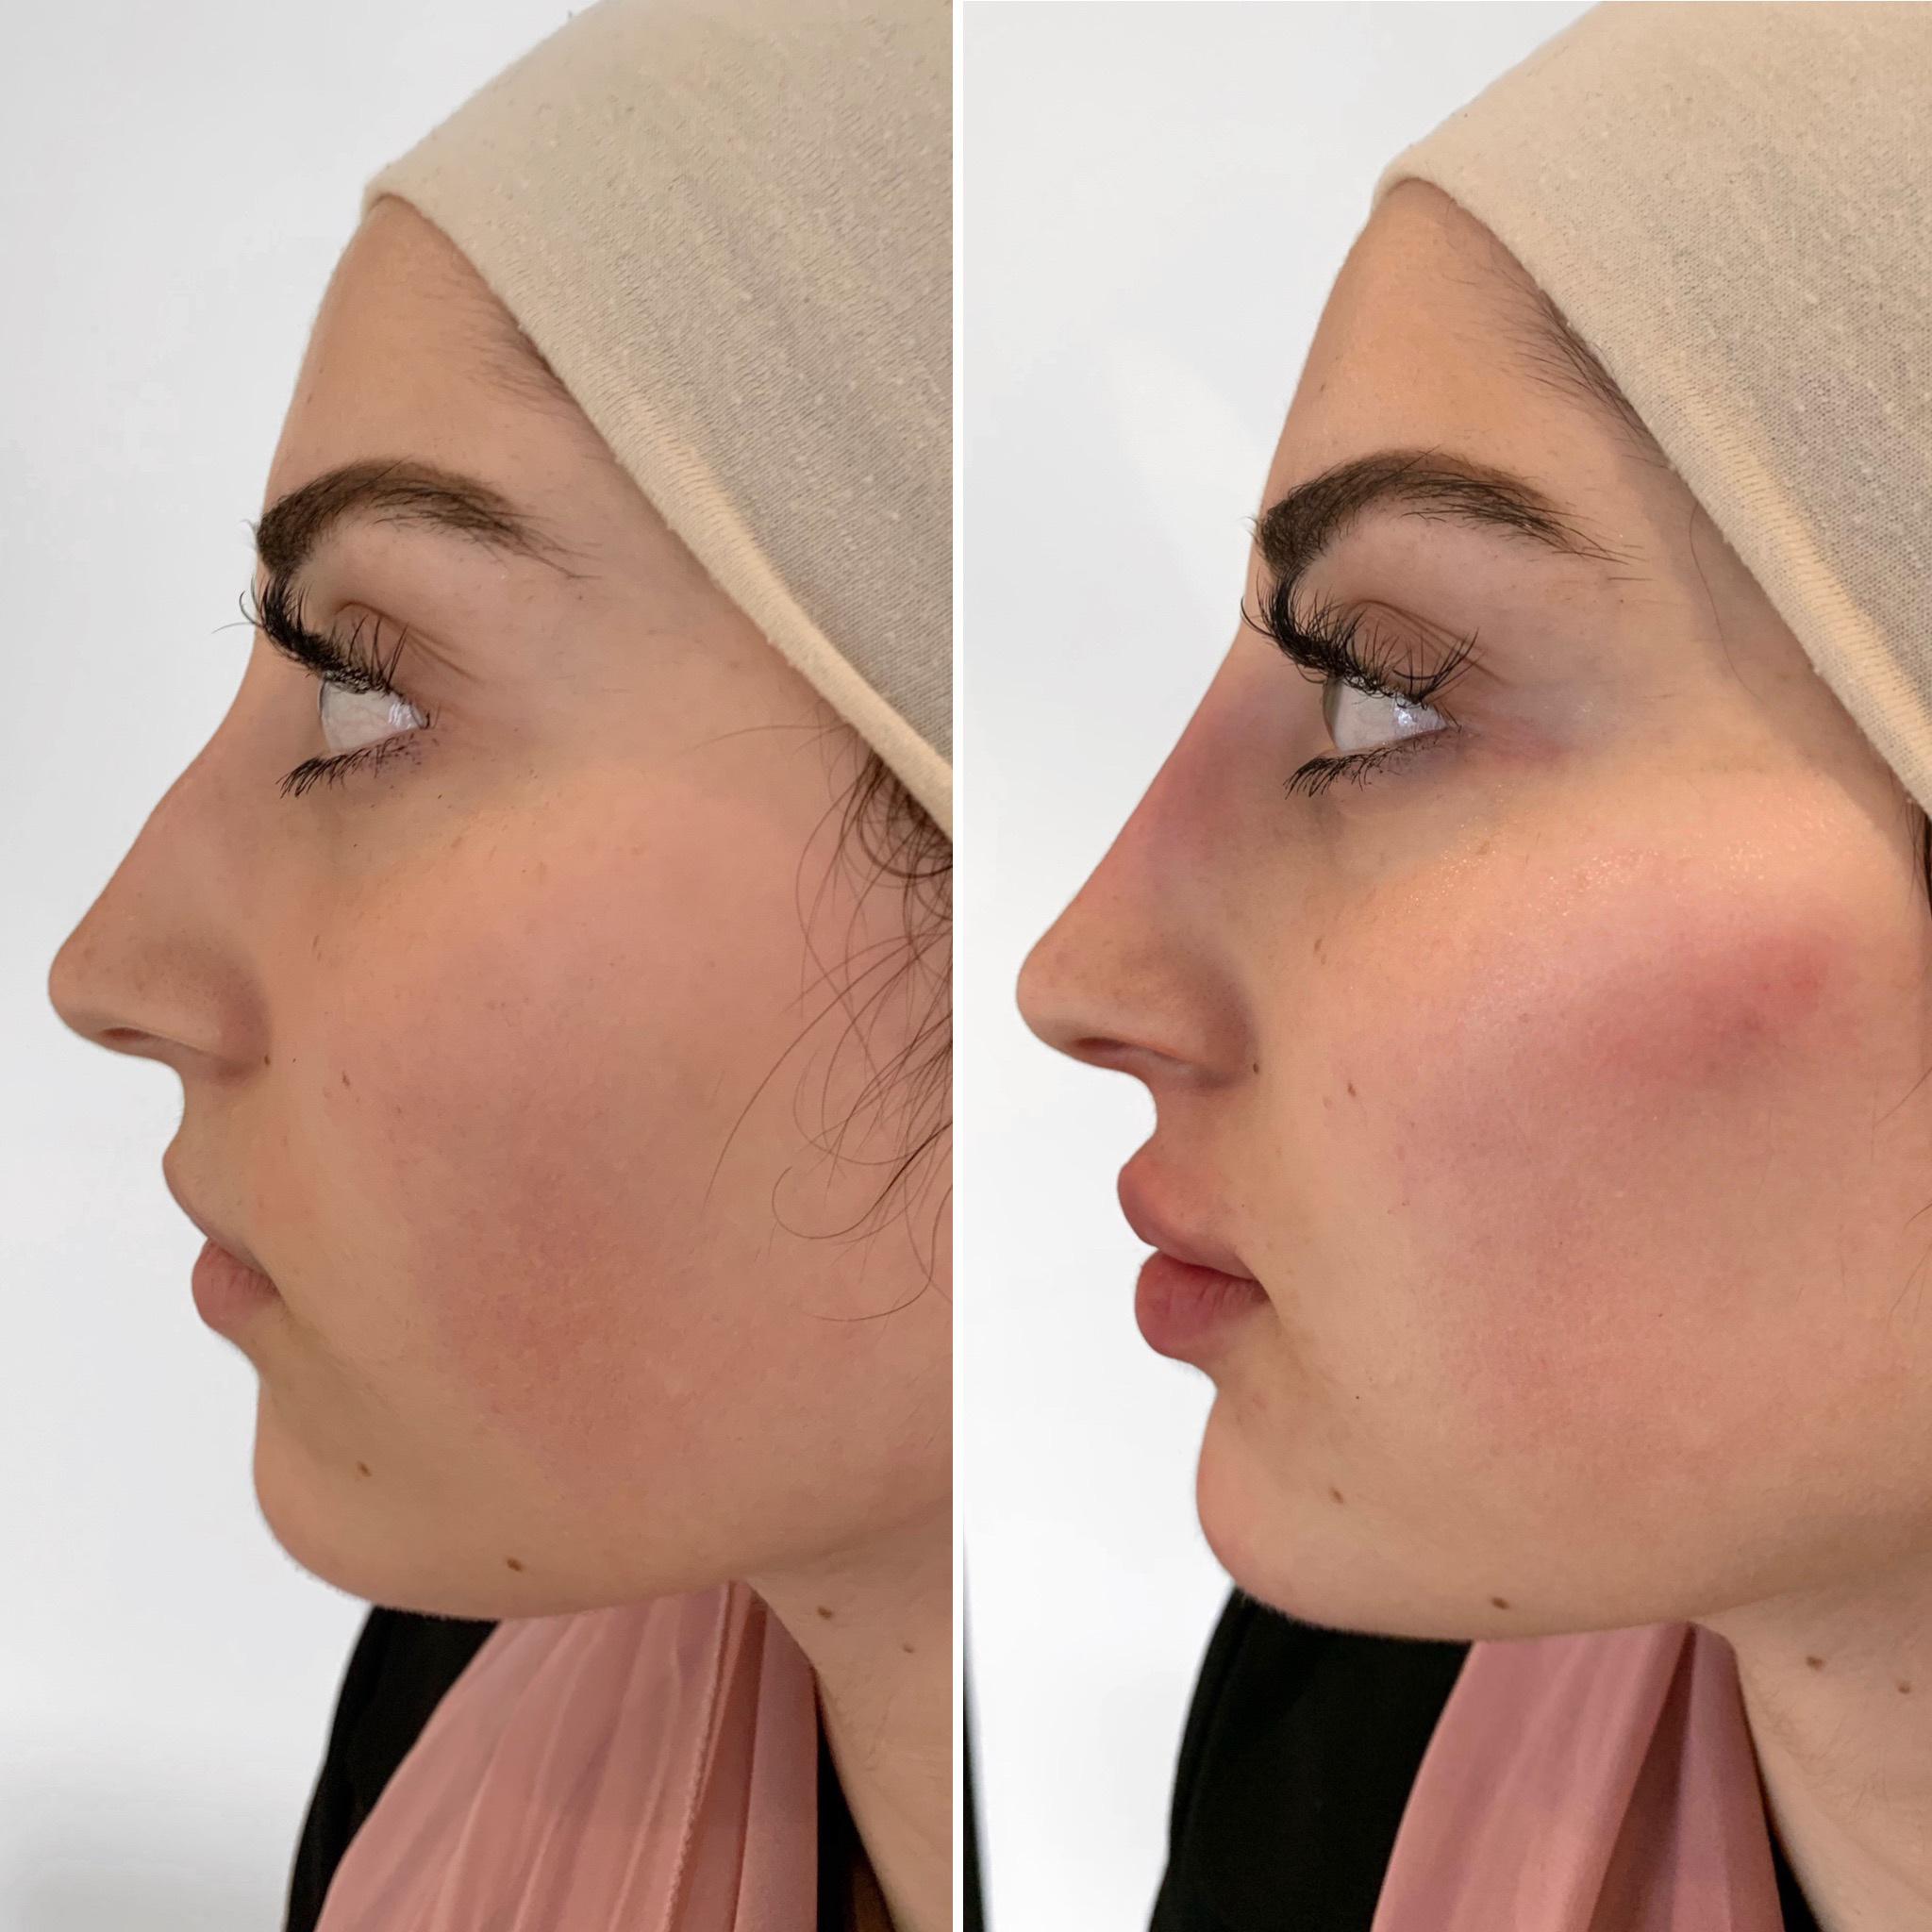 Profile-plasty, Concept Clinics | Aesthetics & Cosmetic Medicine Melbourne